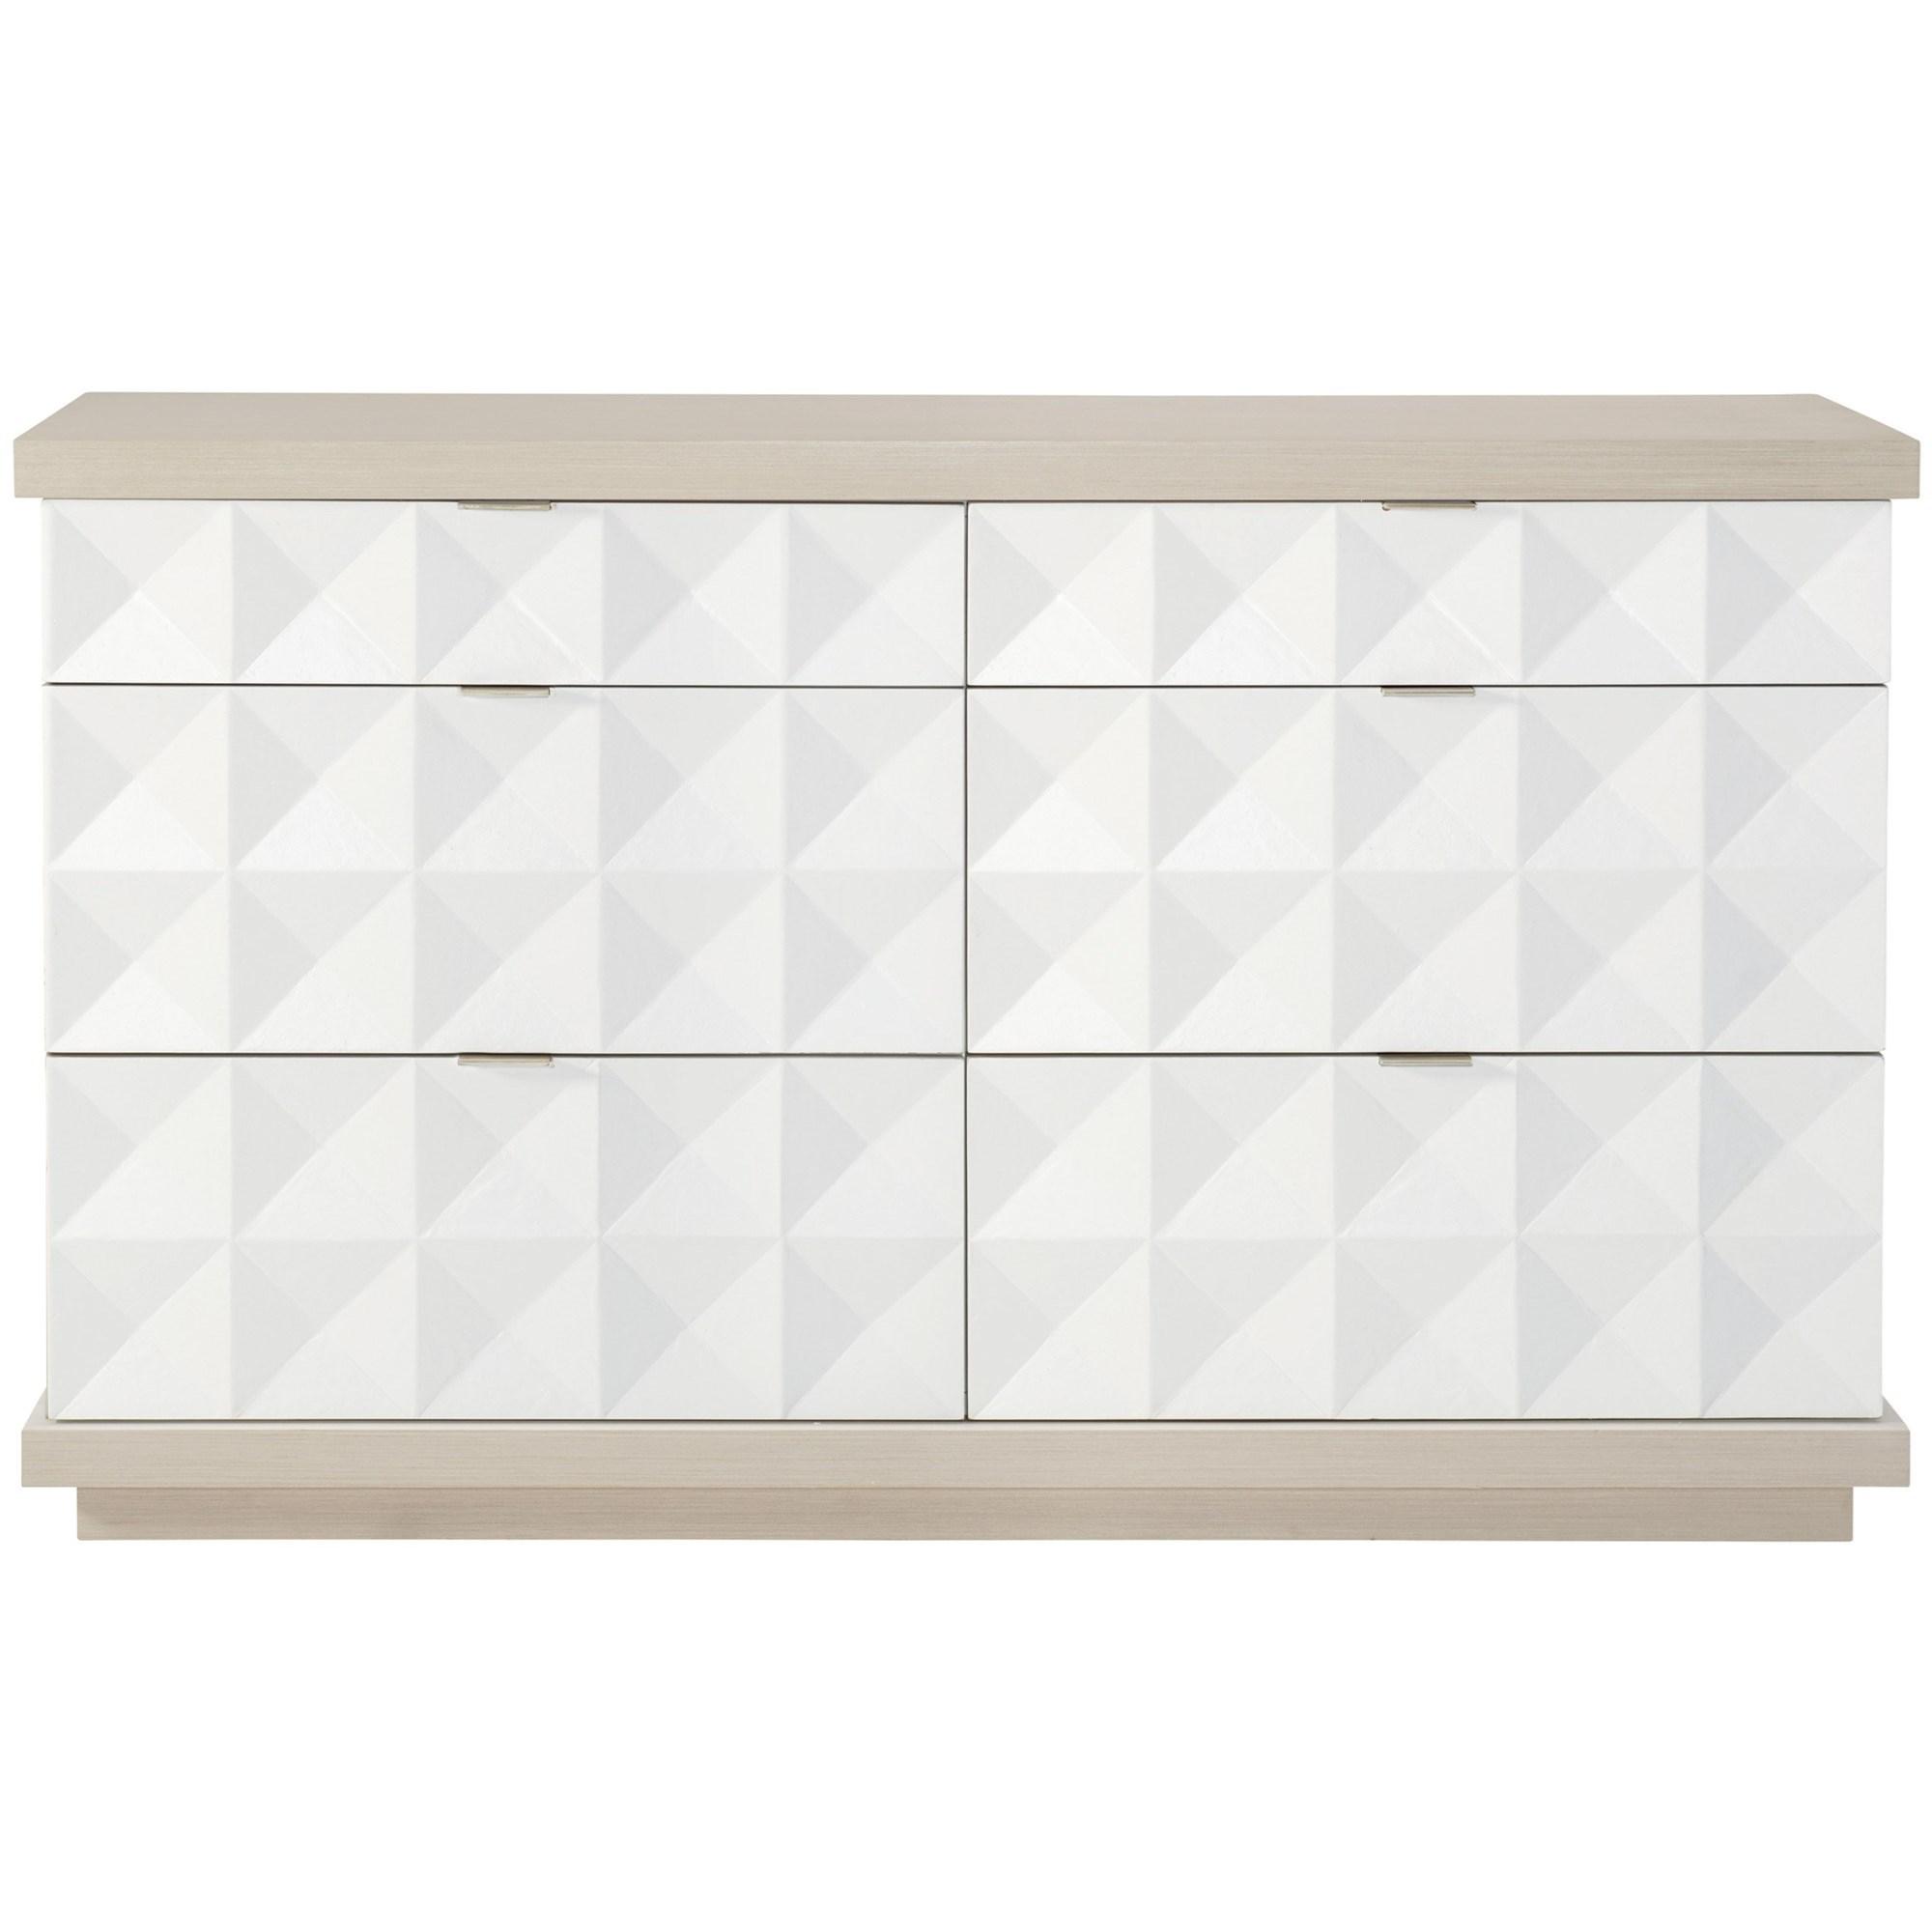 Axiom Dresser by Bernhardt at Baer's Furniture